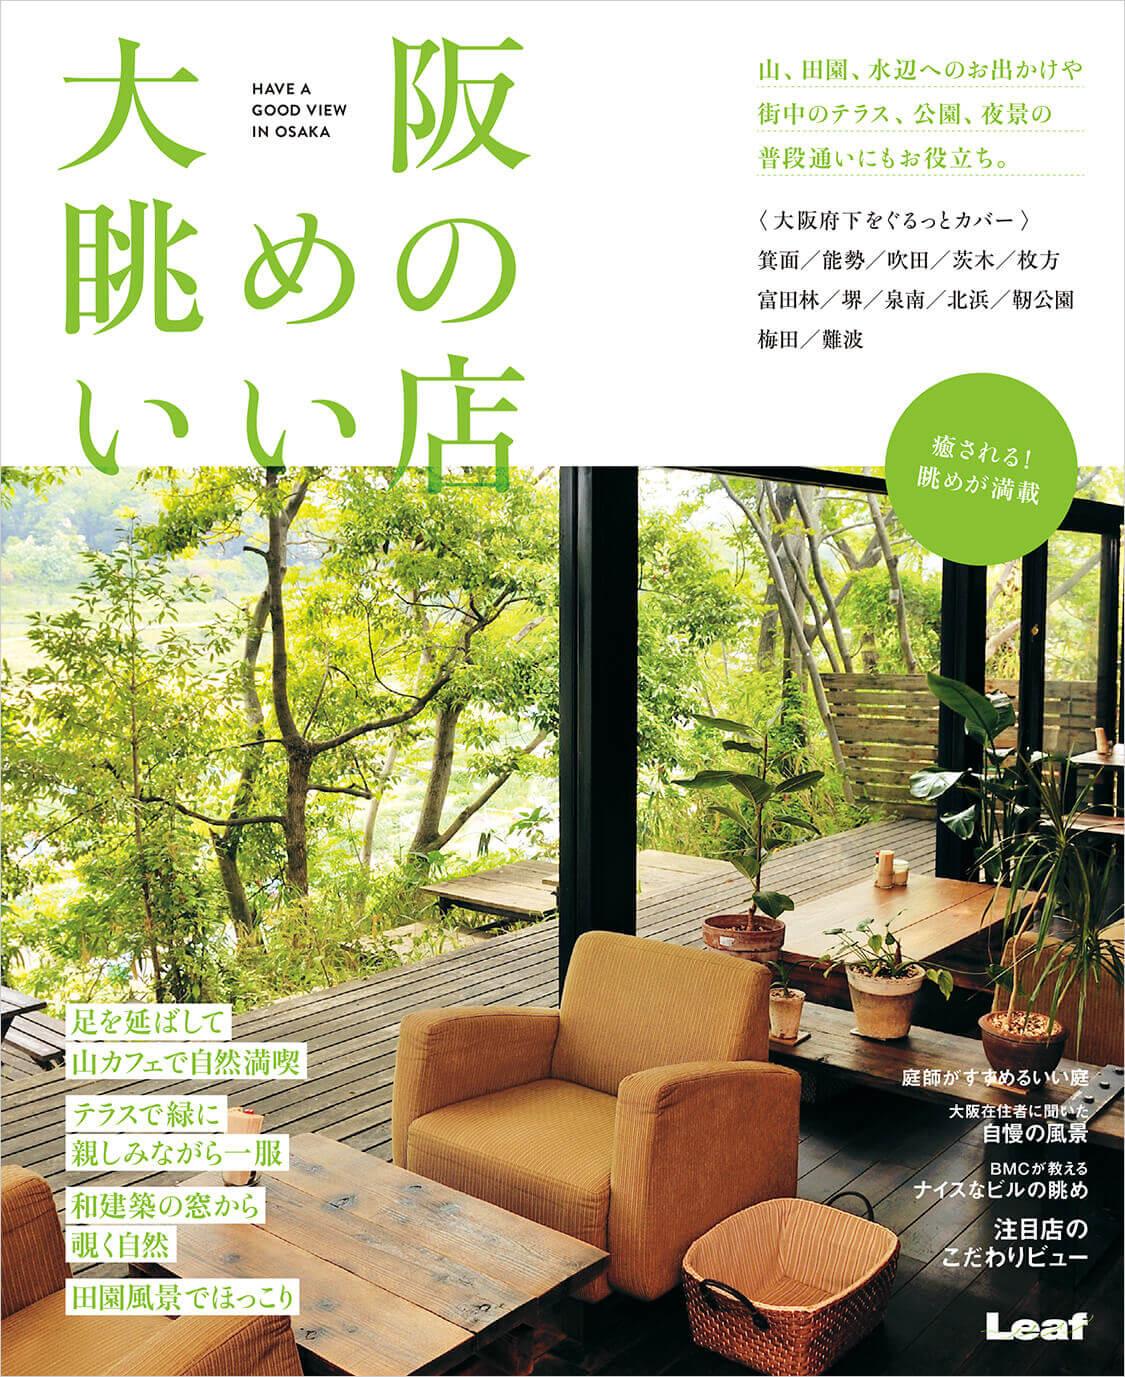 LeafMOOK 【書籍】大阪眺めのいい店